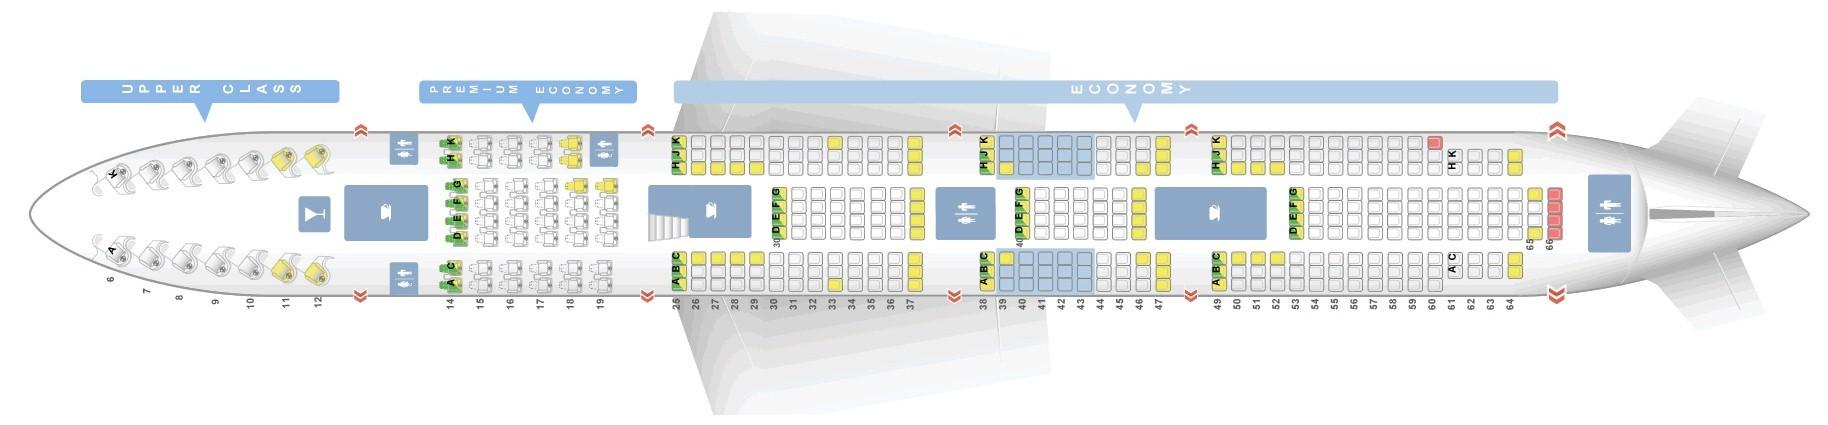 Virgin_Atlantic_Airways_B747-400_LGW-1_U